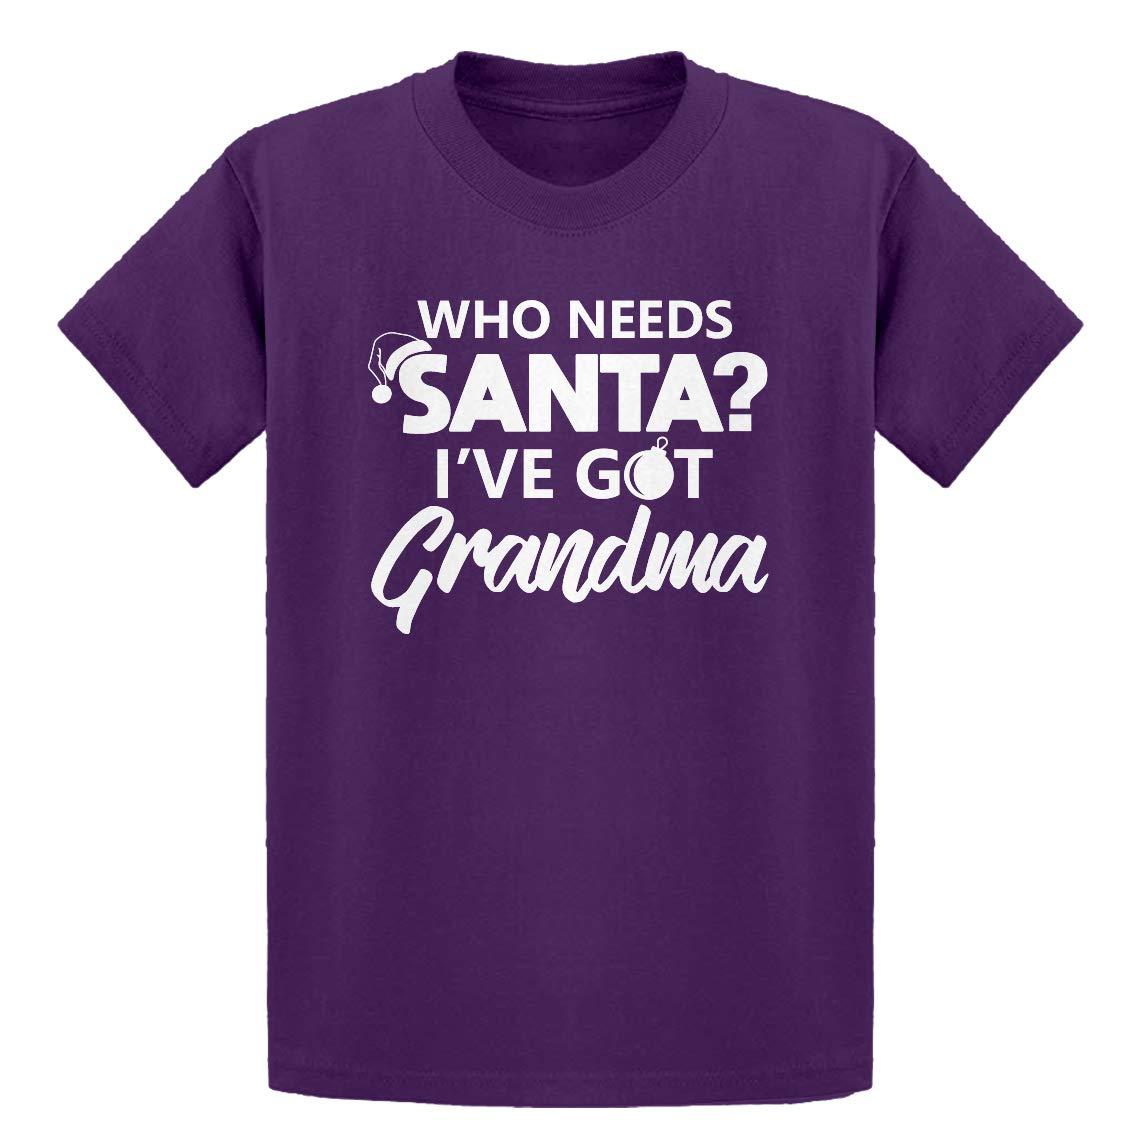 Kids T-Shirt Ive got Grandma Indica Plateau Youth Who Needs Santa